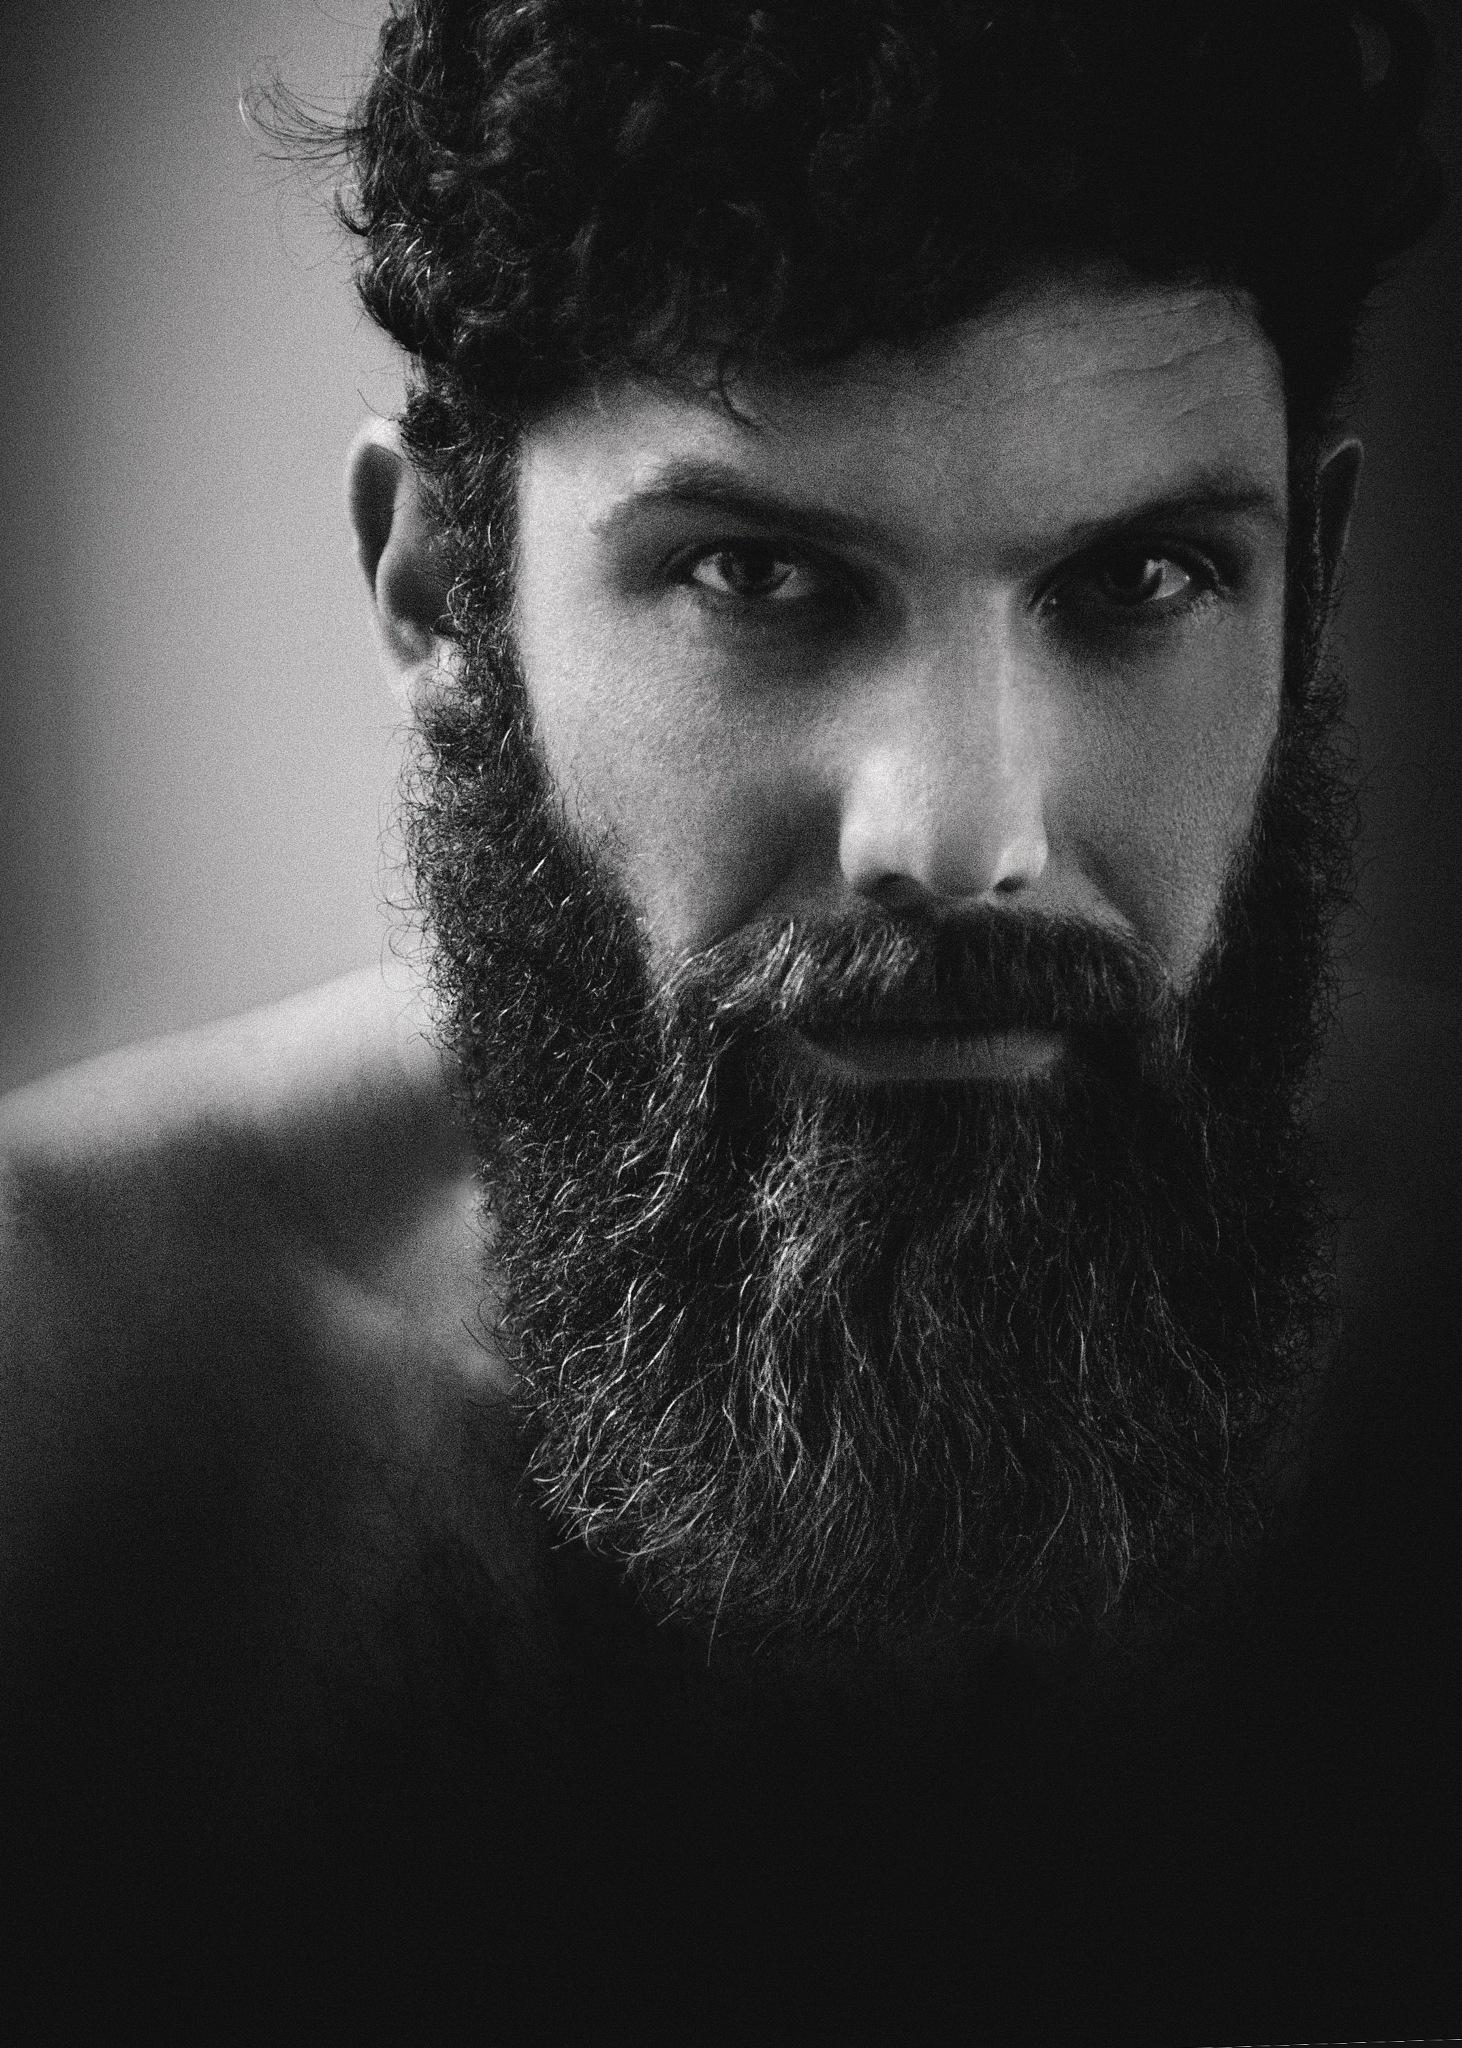 bearded man by Kristina Zvinakeviciute